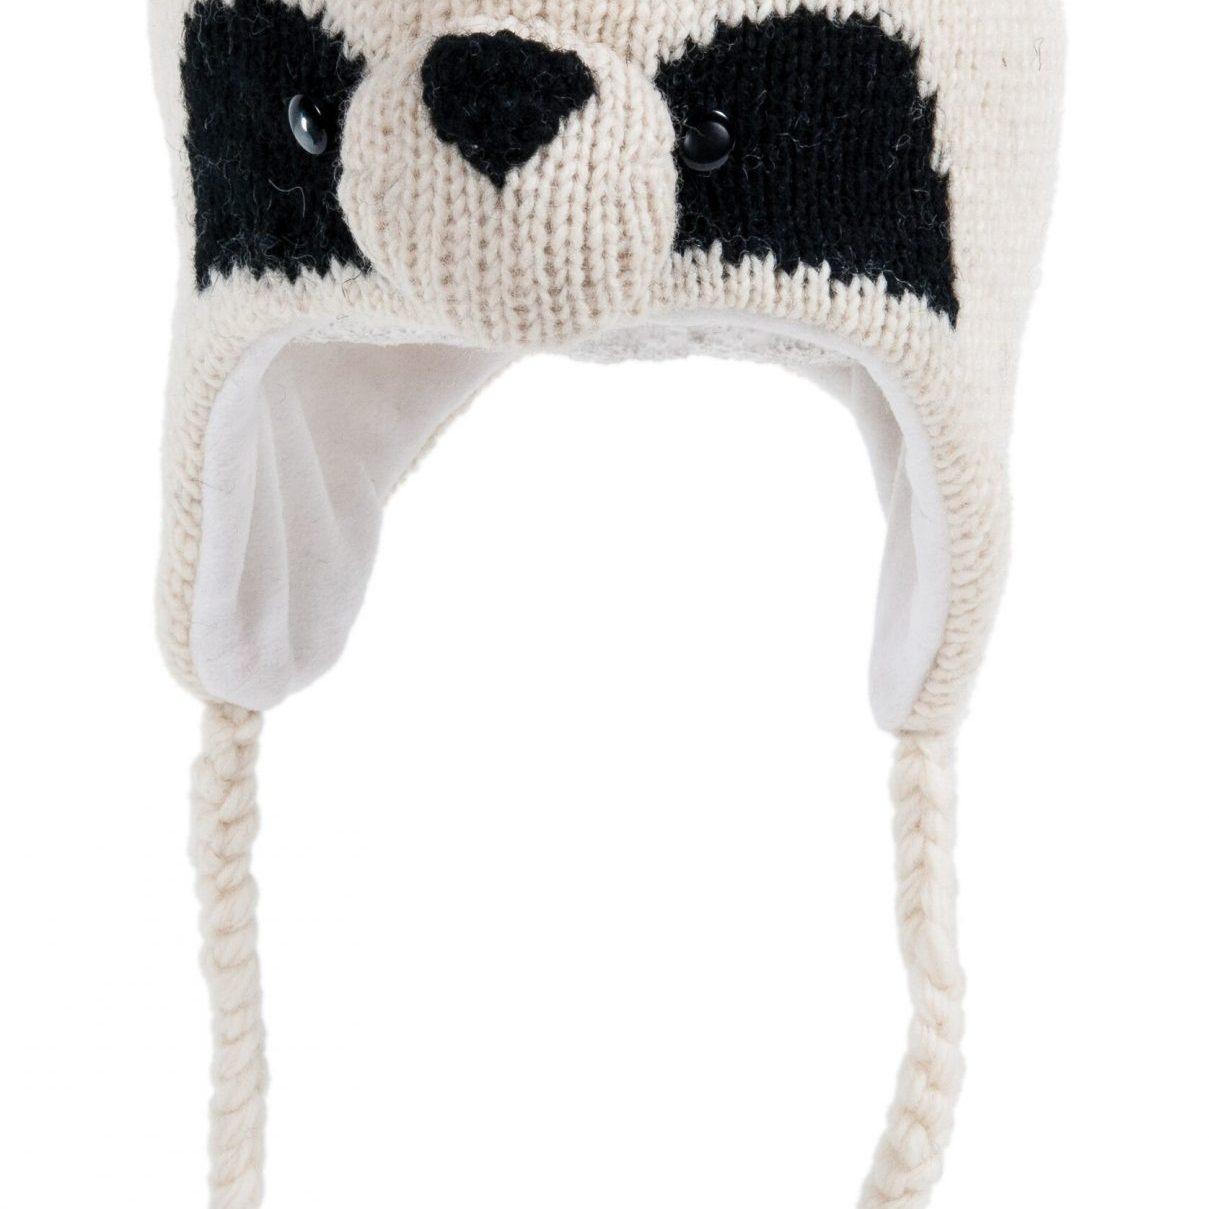 cute panda knitted hat